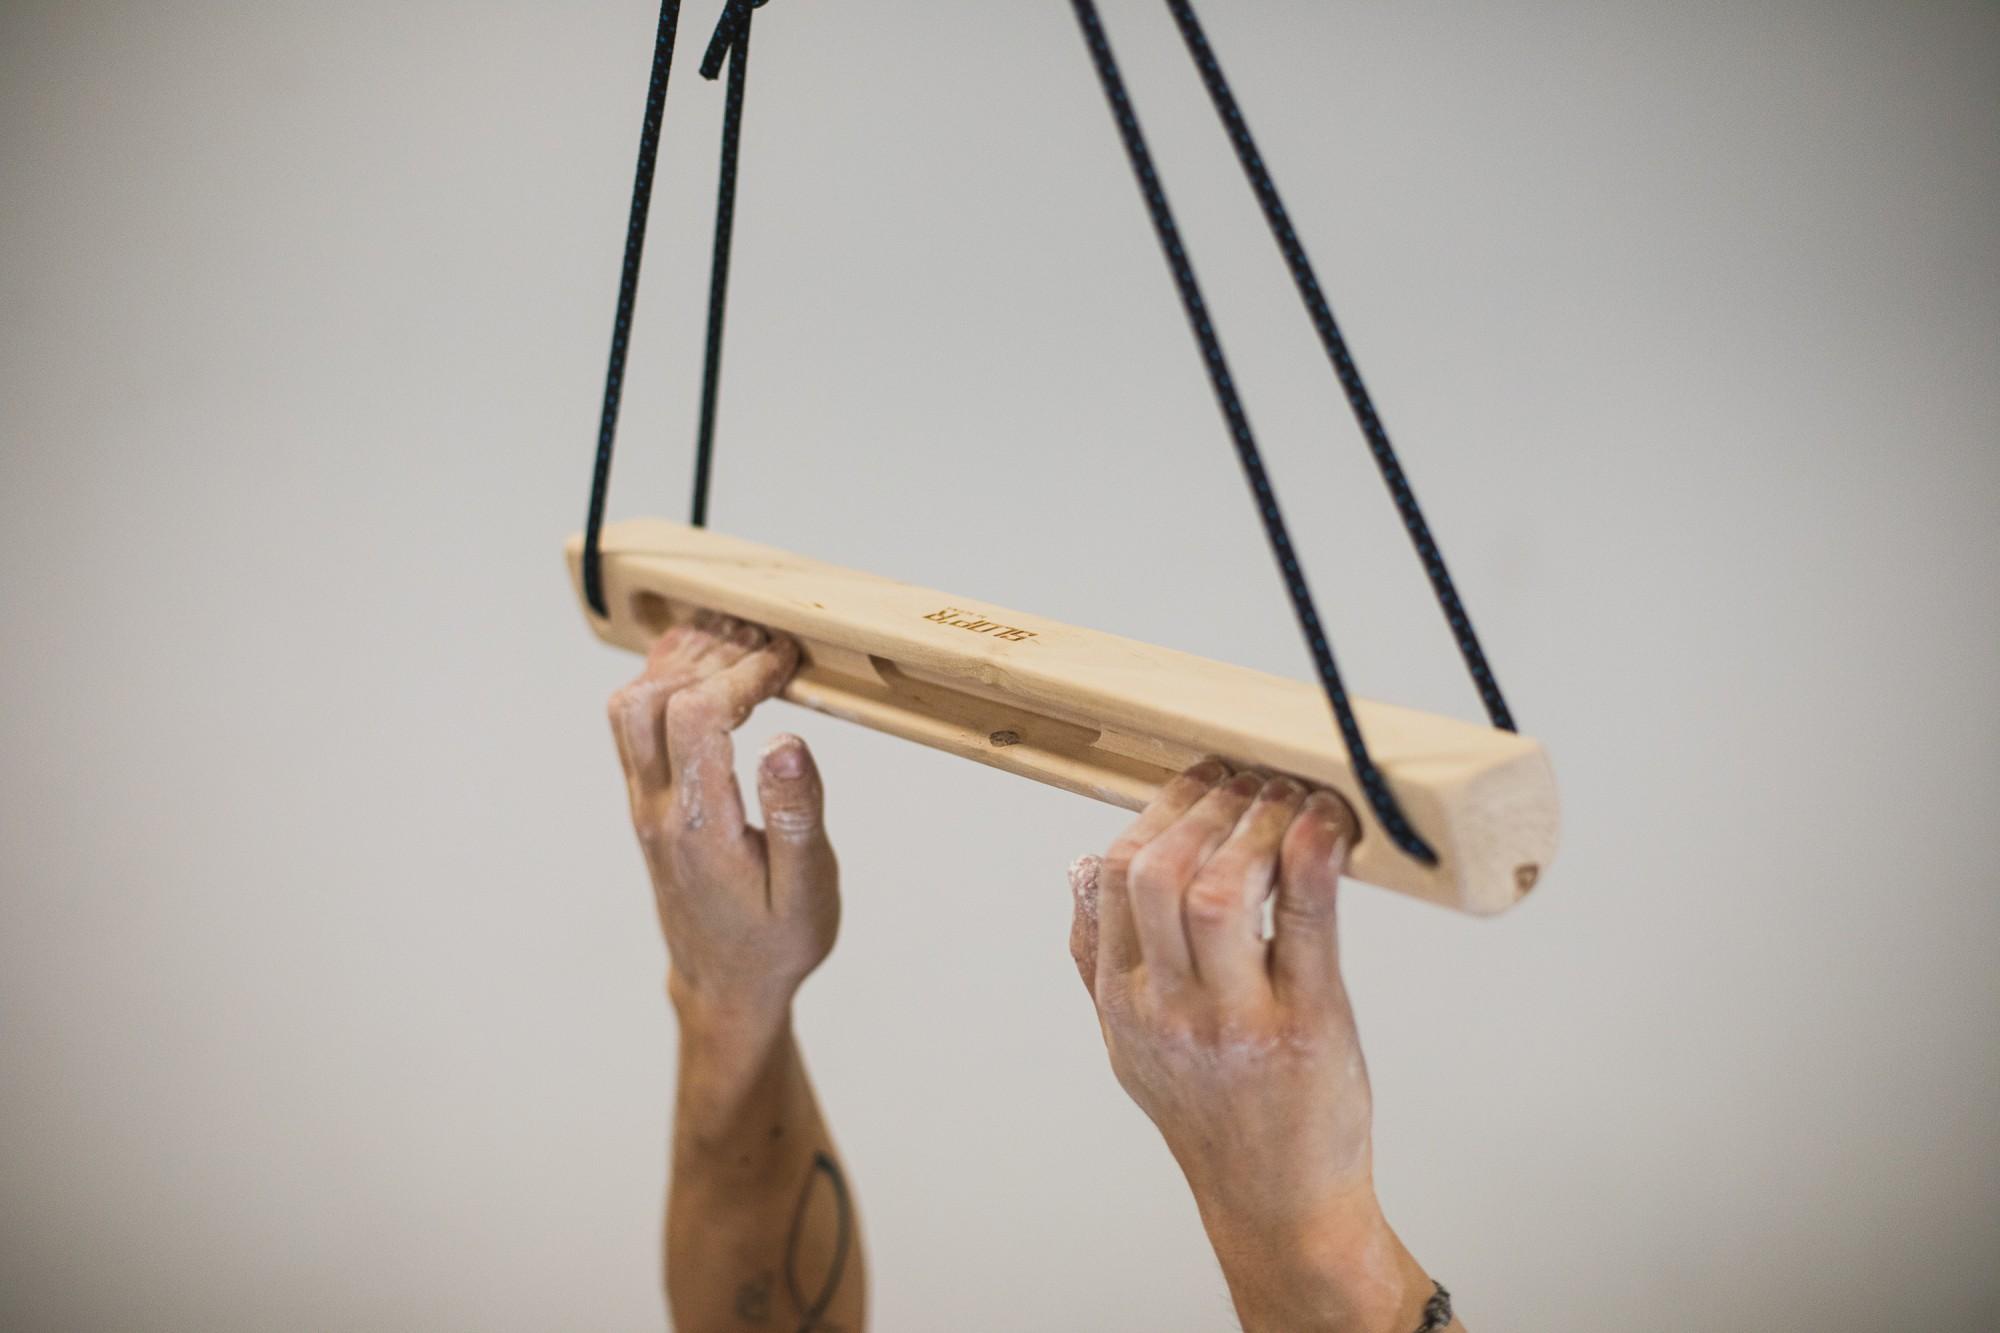 Slop'r mobile hangboard